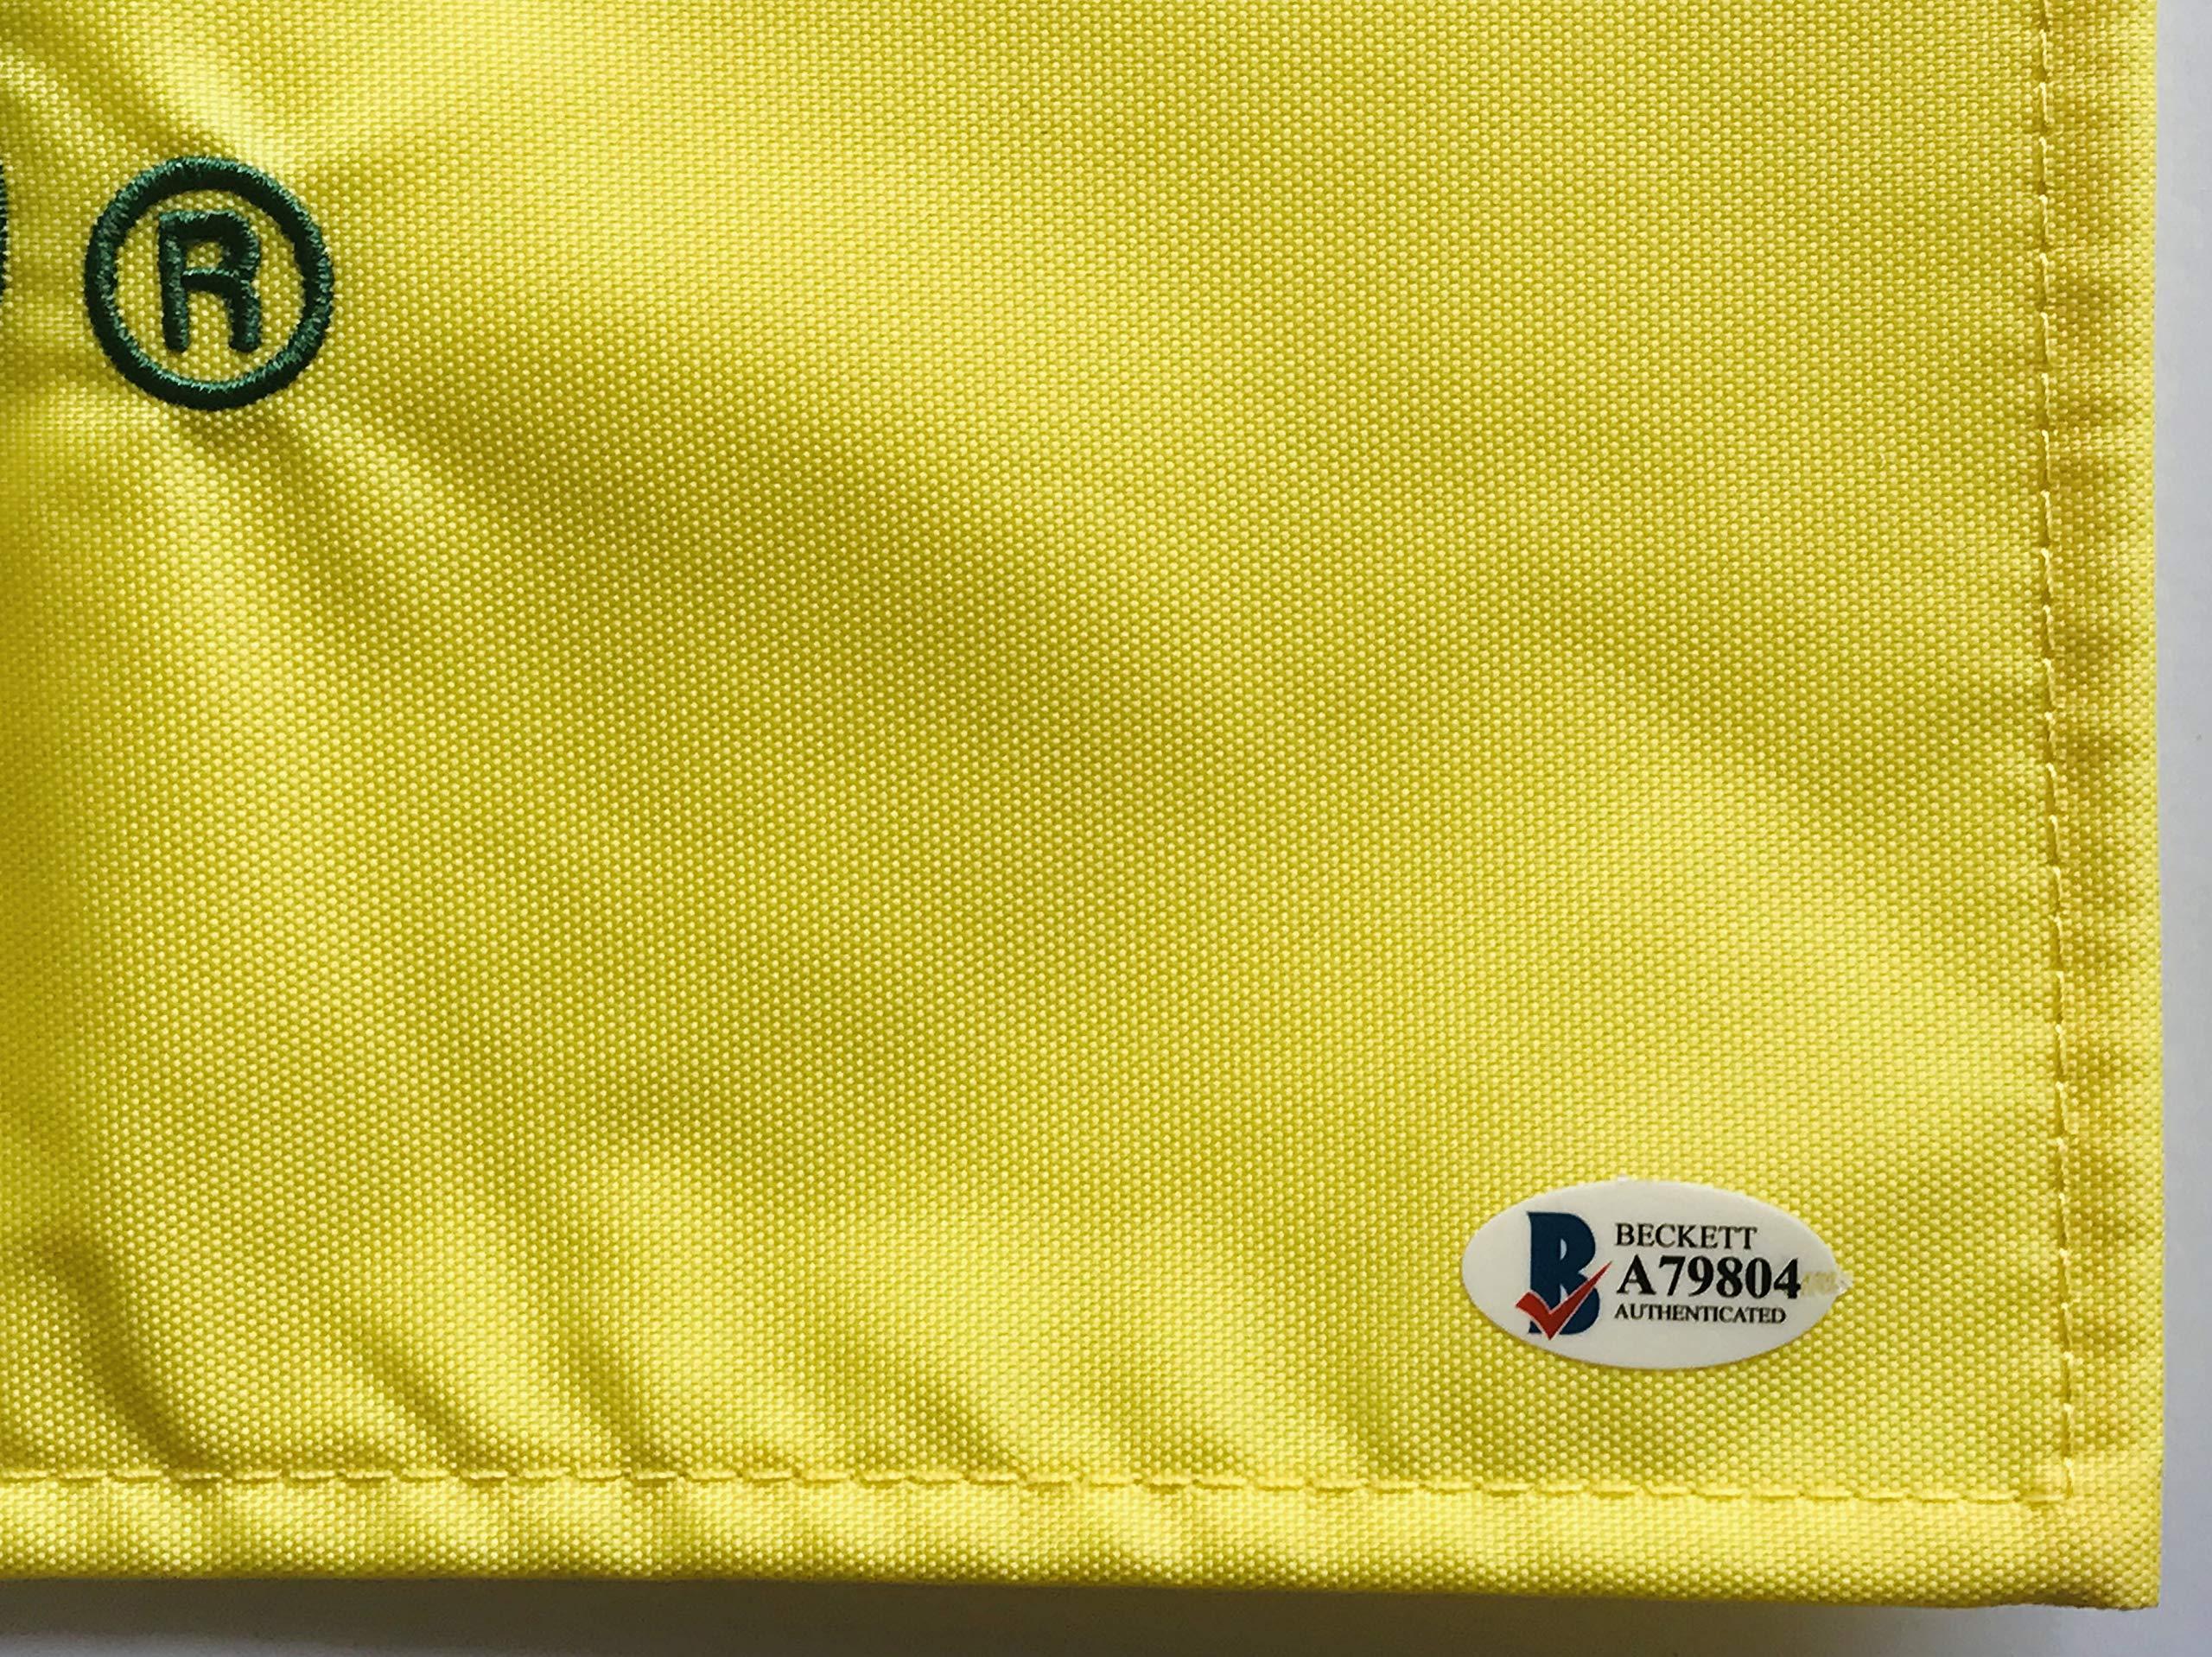 Jack Nicklaus signed Masters golf flag undated beckett loa pga augusta national